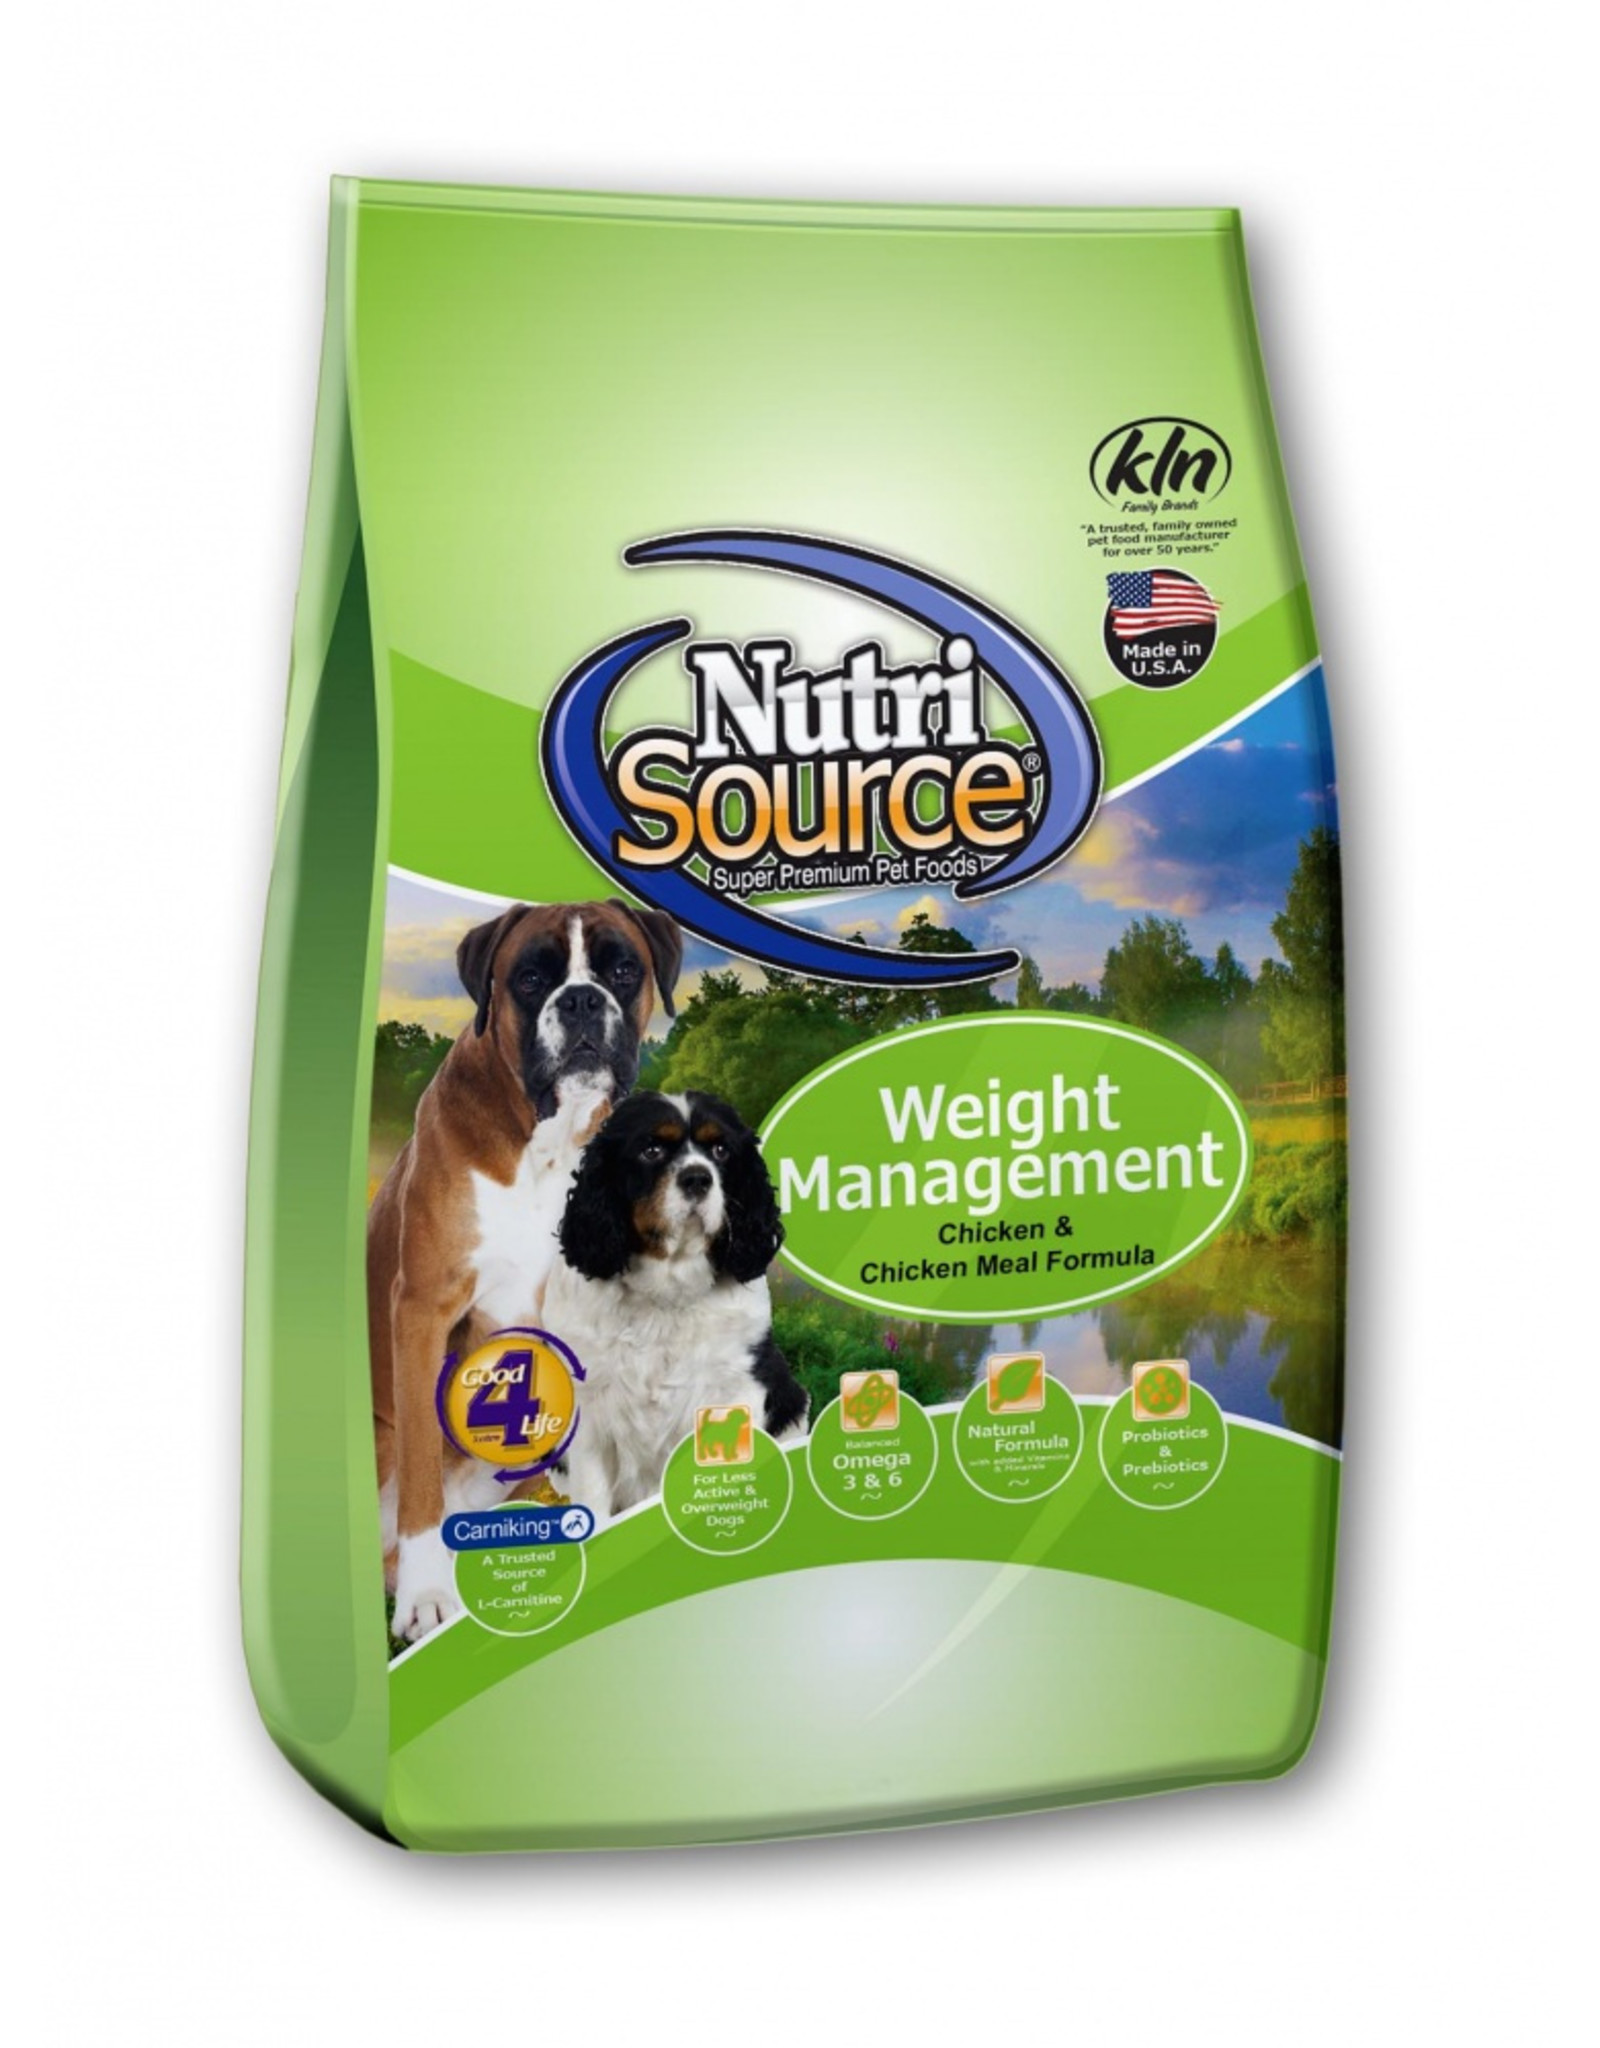 NutriSource Pet Foods NUTRISOURCE DOG WEIGHT MANAGEMENT CHICKEN & RICE FORMULA 30LB